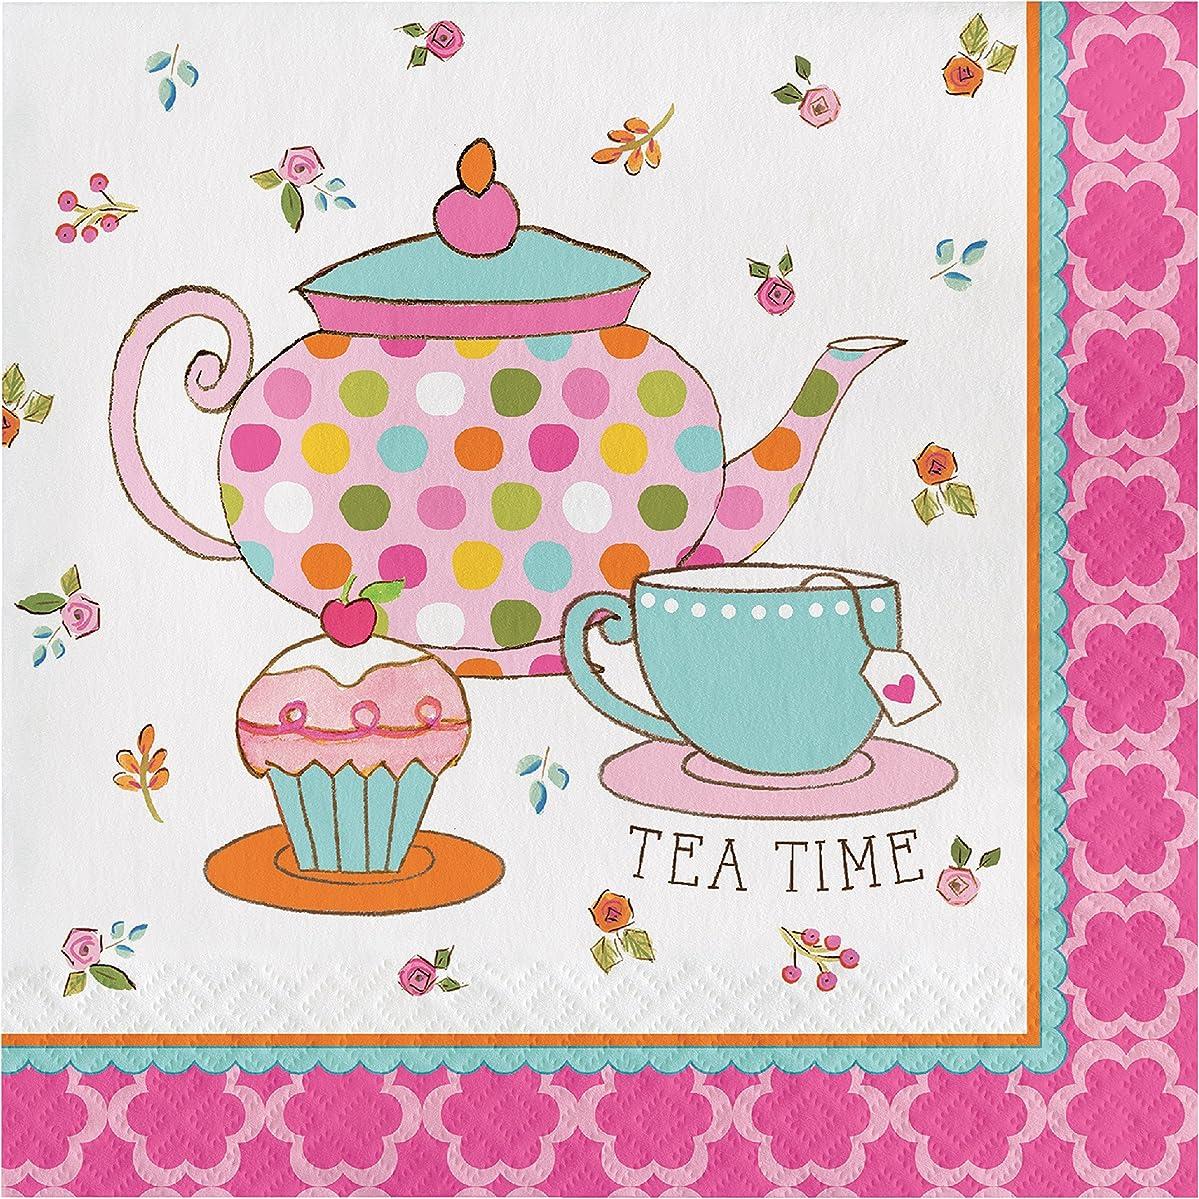 Tea Time Napkins, 48 ct